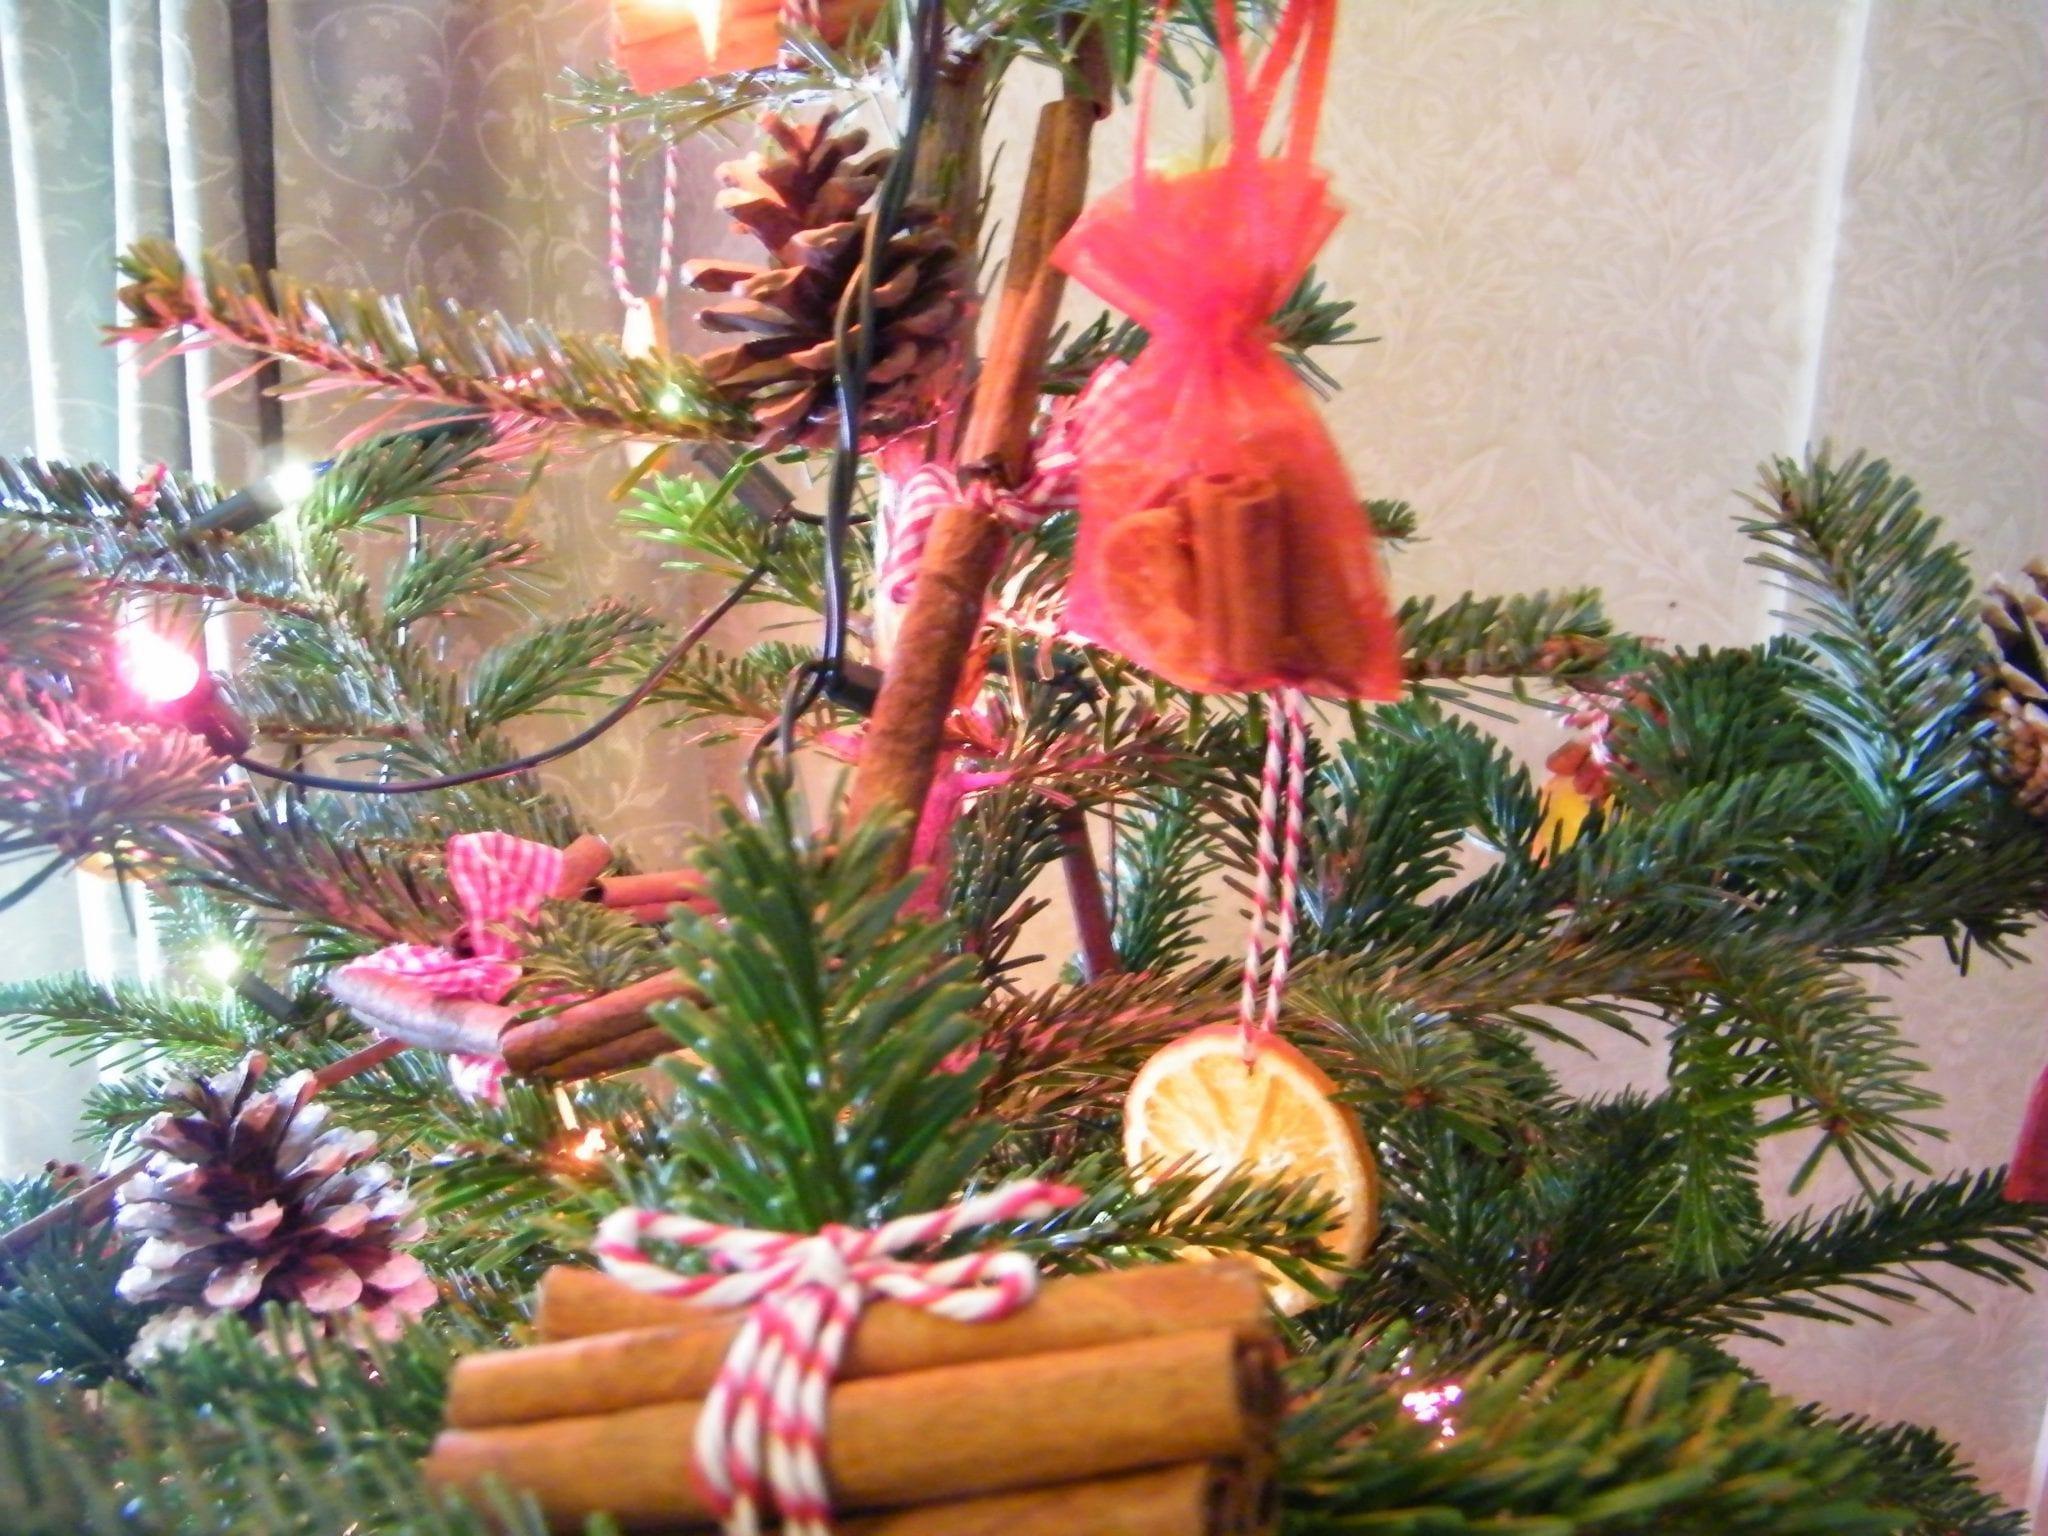 Christmas Tree Homemade Decorations Dried Flower Craft